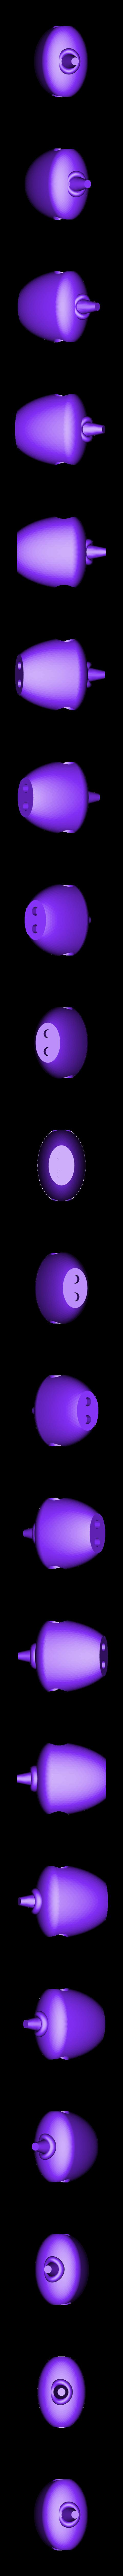 body_upper_1.stl Download free STL file Guard Rob (robot) • 3D print design, NohaBody